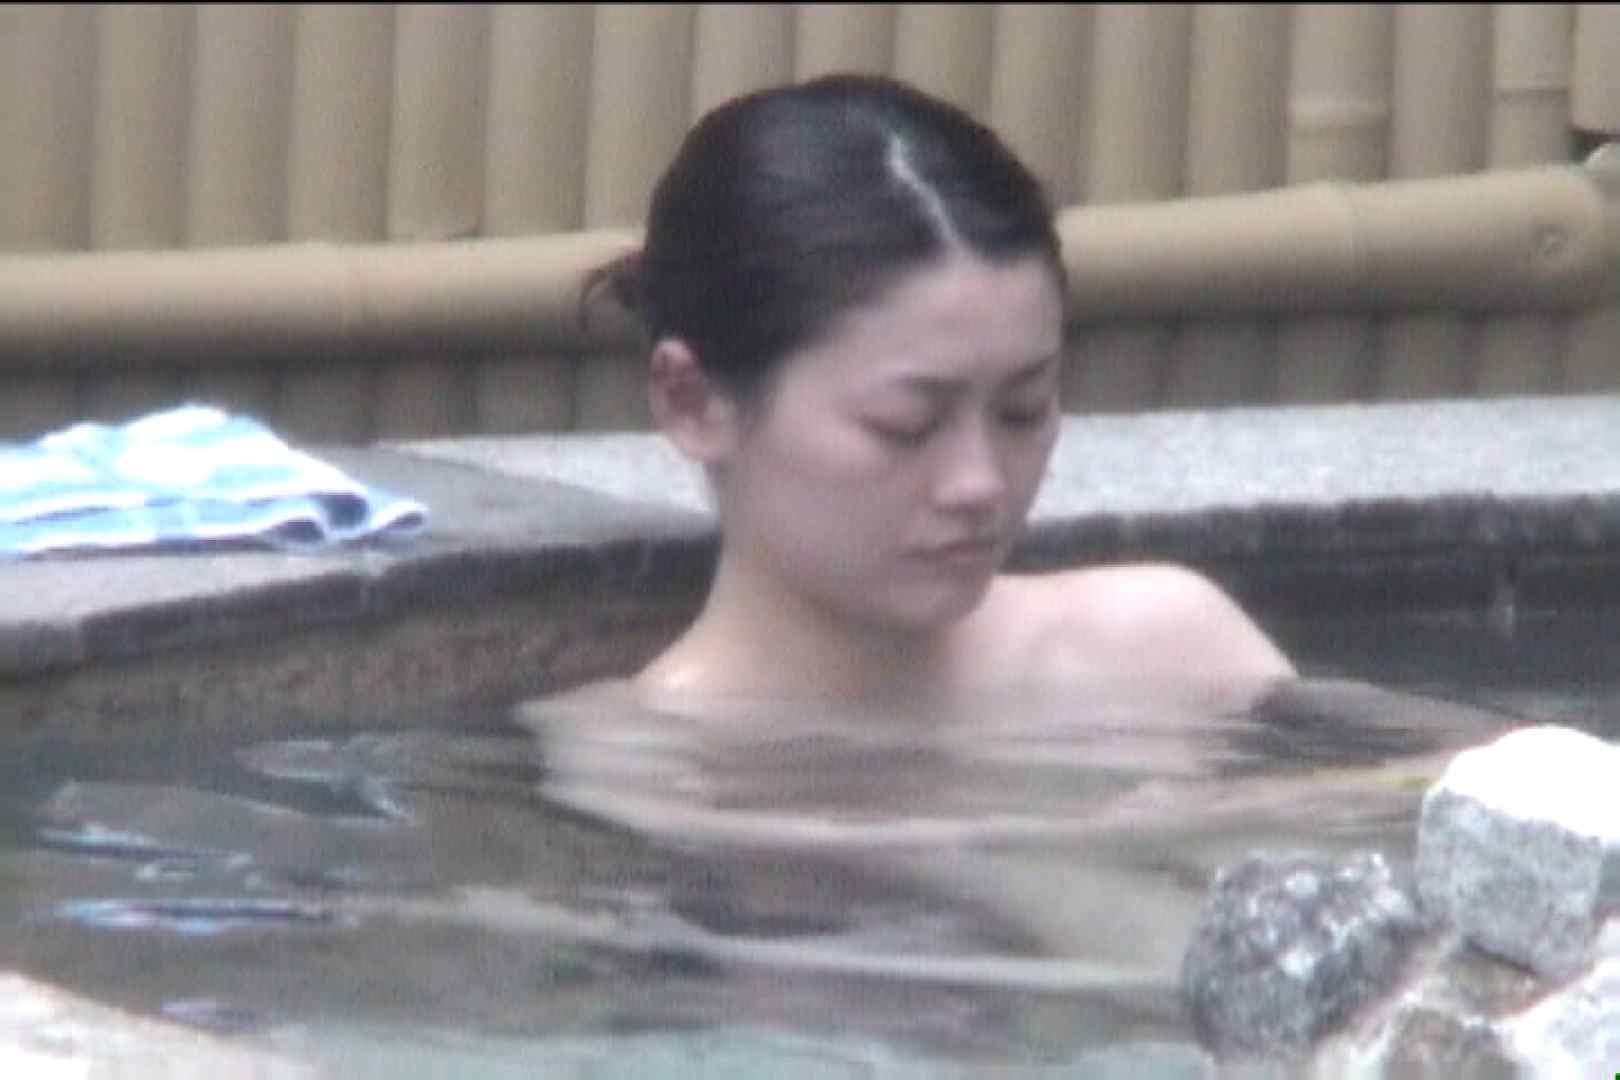 Aquaな露天風呂Vol.92【VIP限定】 盗撮 | OLのエロ生活  33連発 19